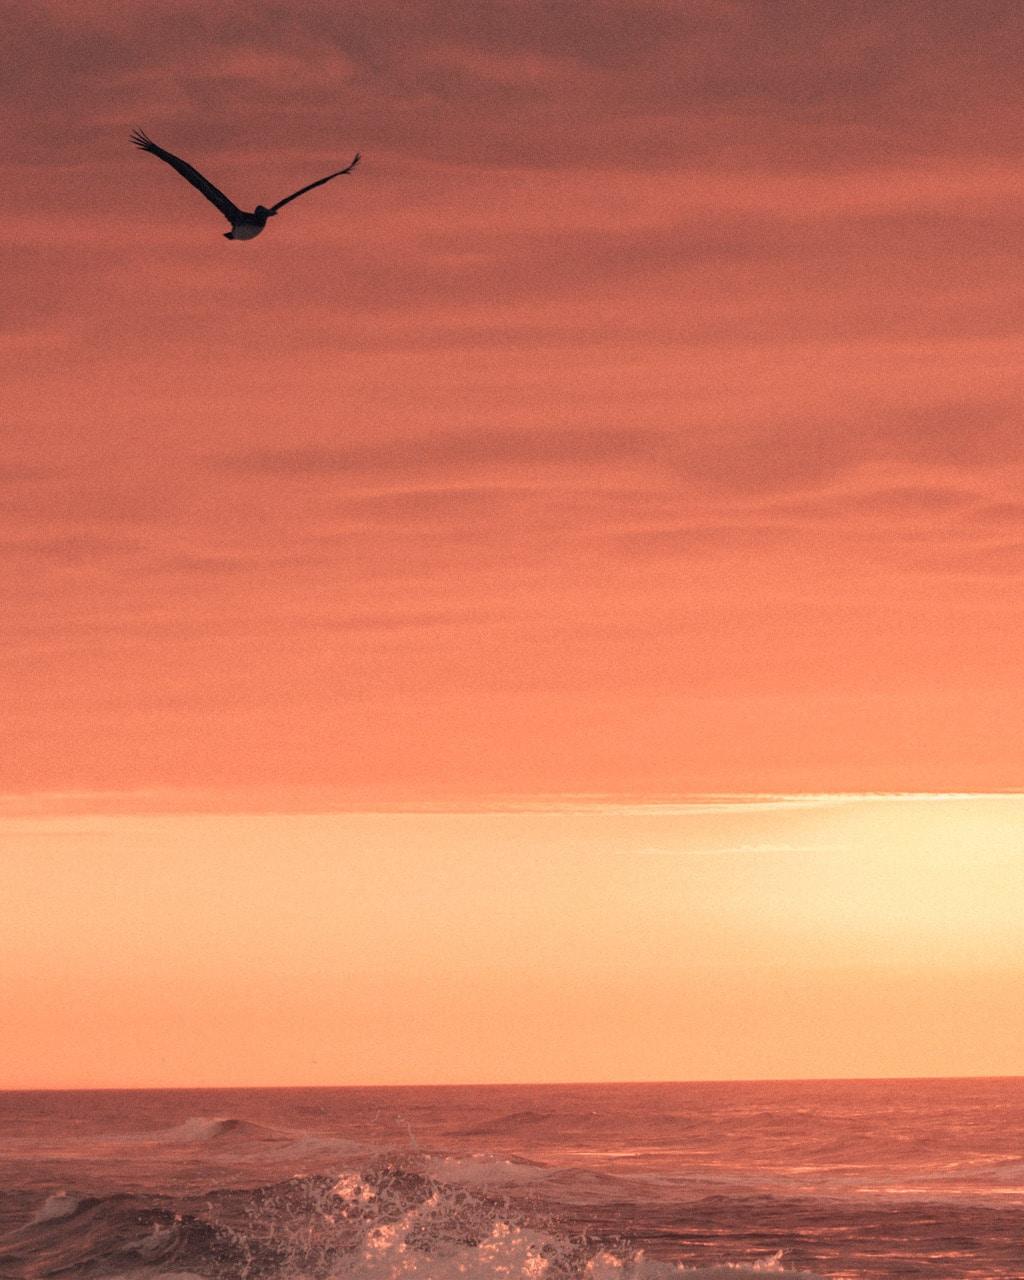 Pensacola beach sunrise with seagull